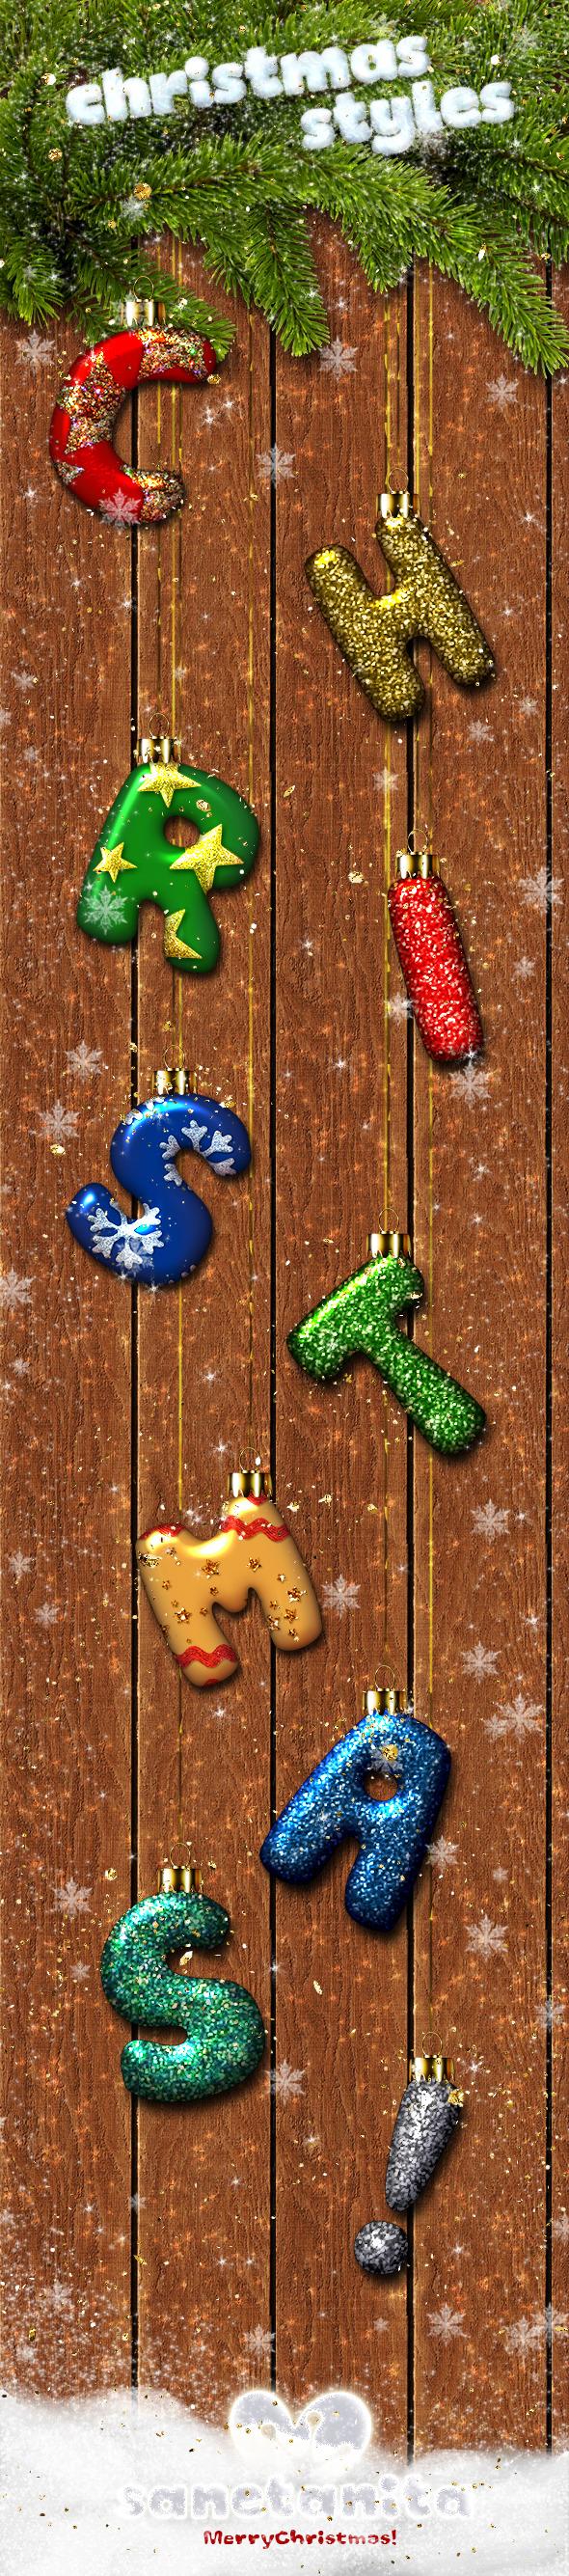 Christmas Ball Styles